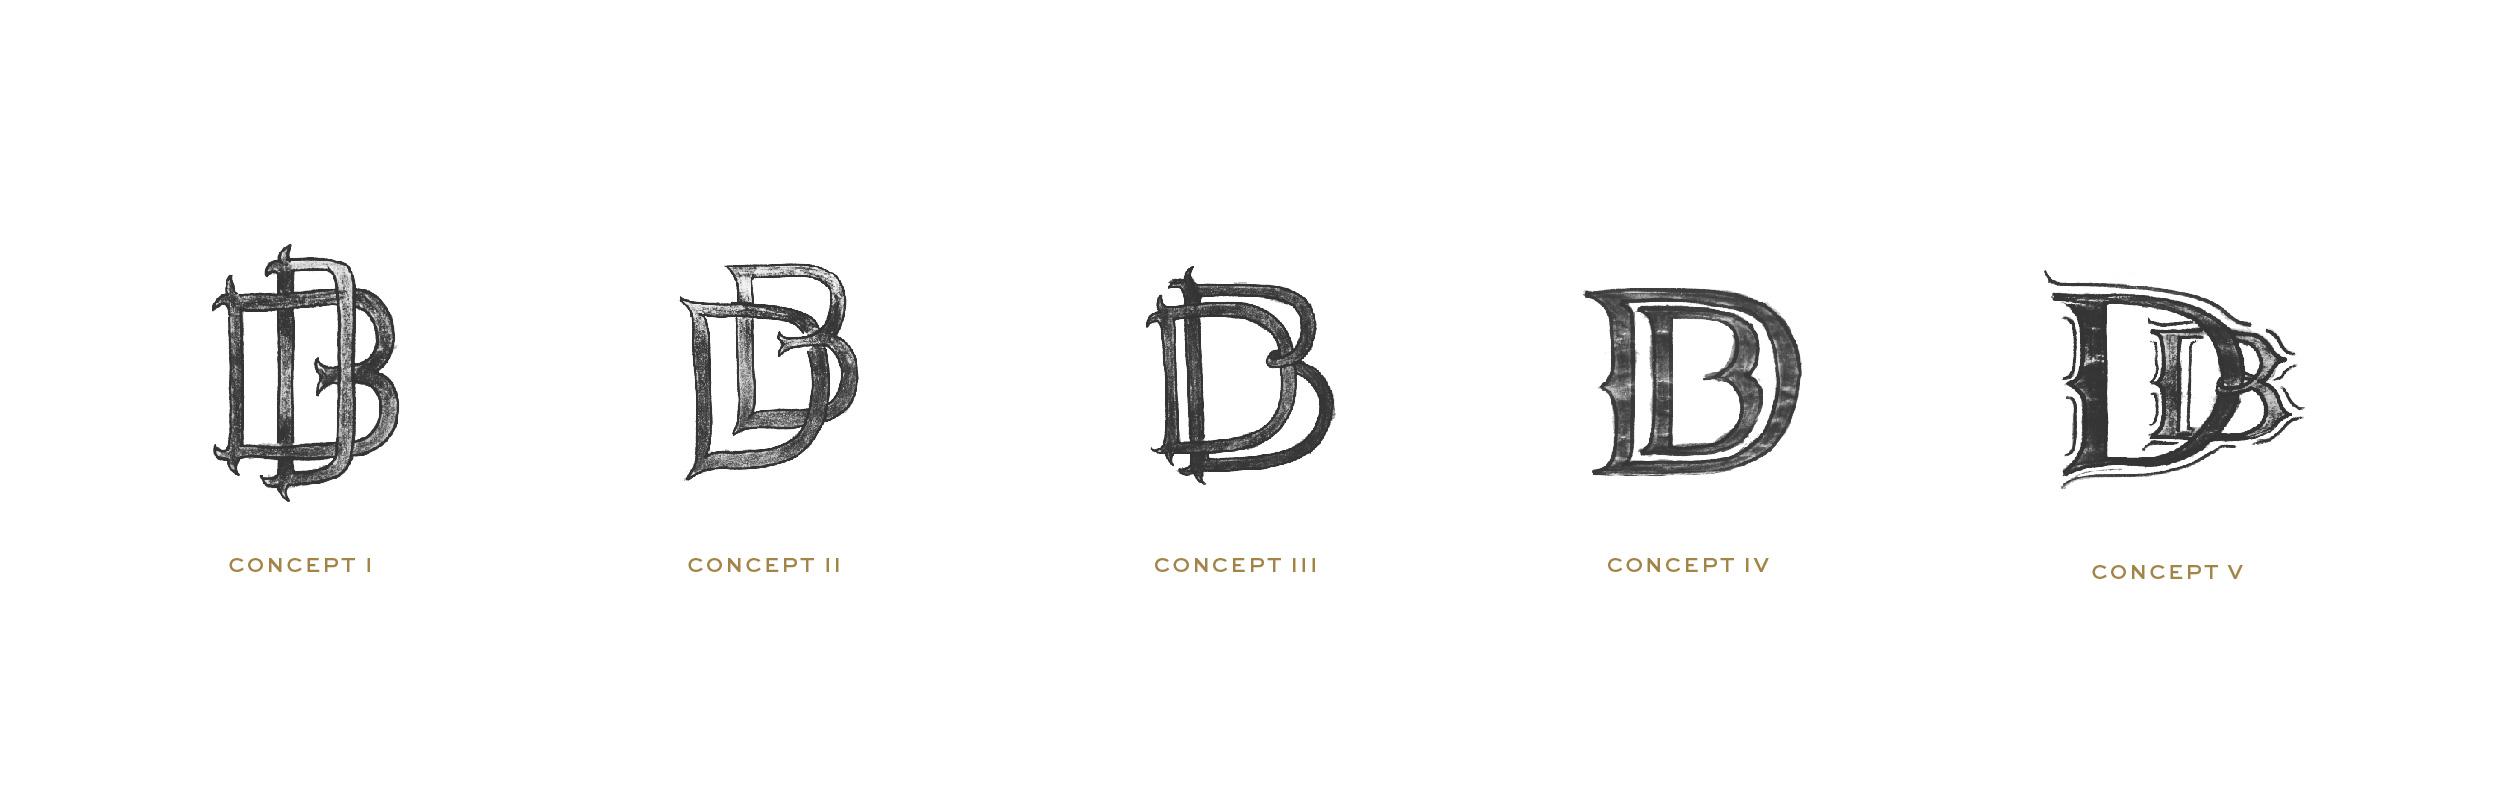 drakbarry-monogram-process-andrea-crofts.jpg